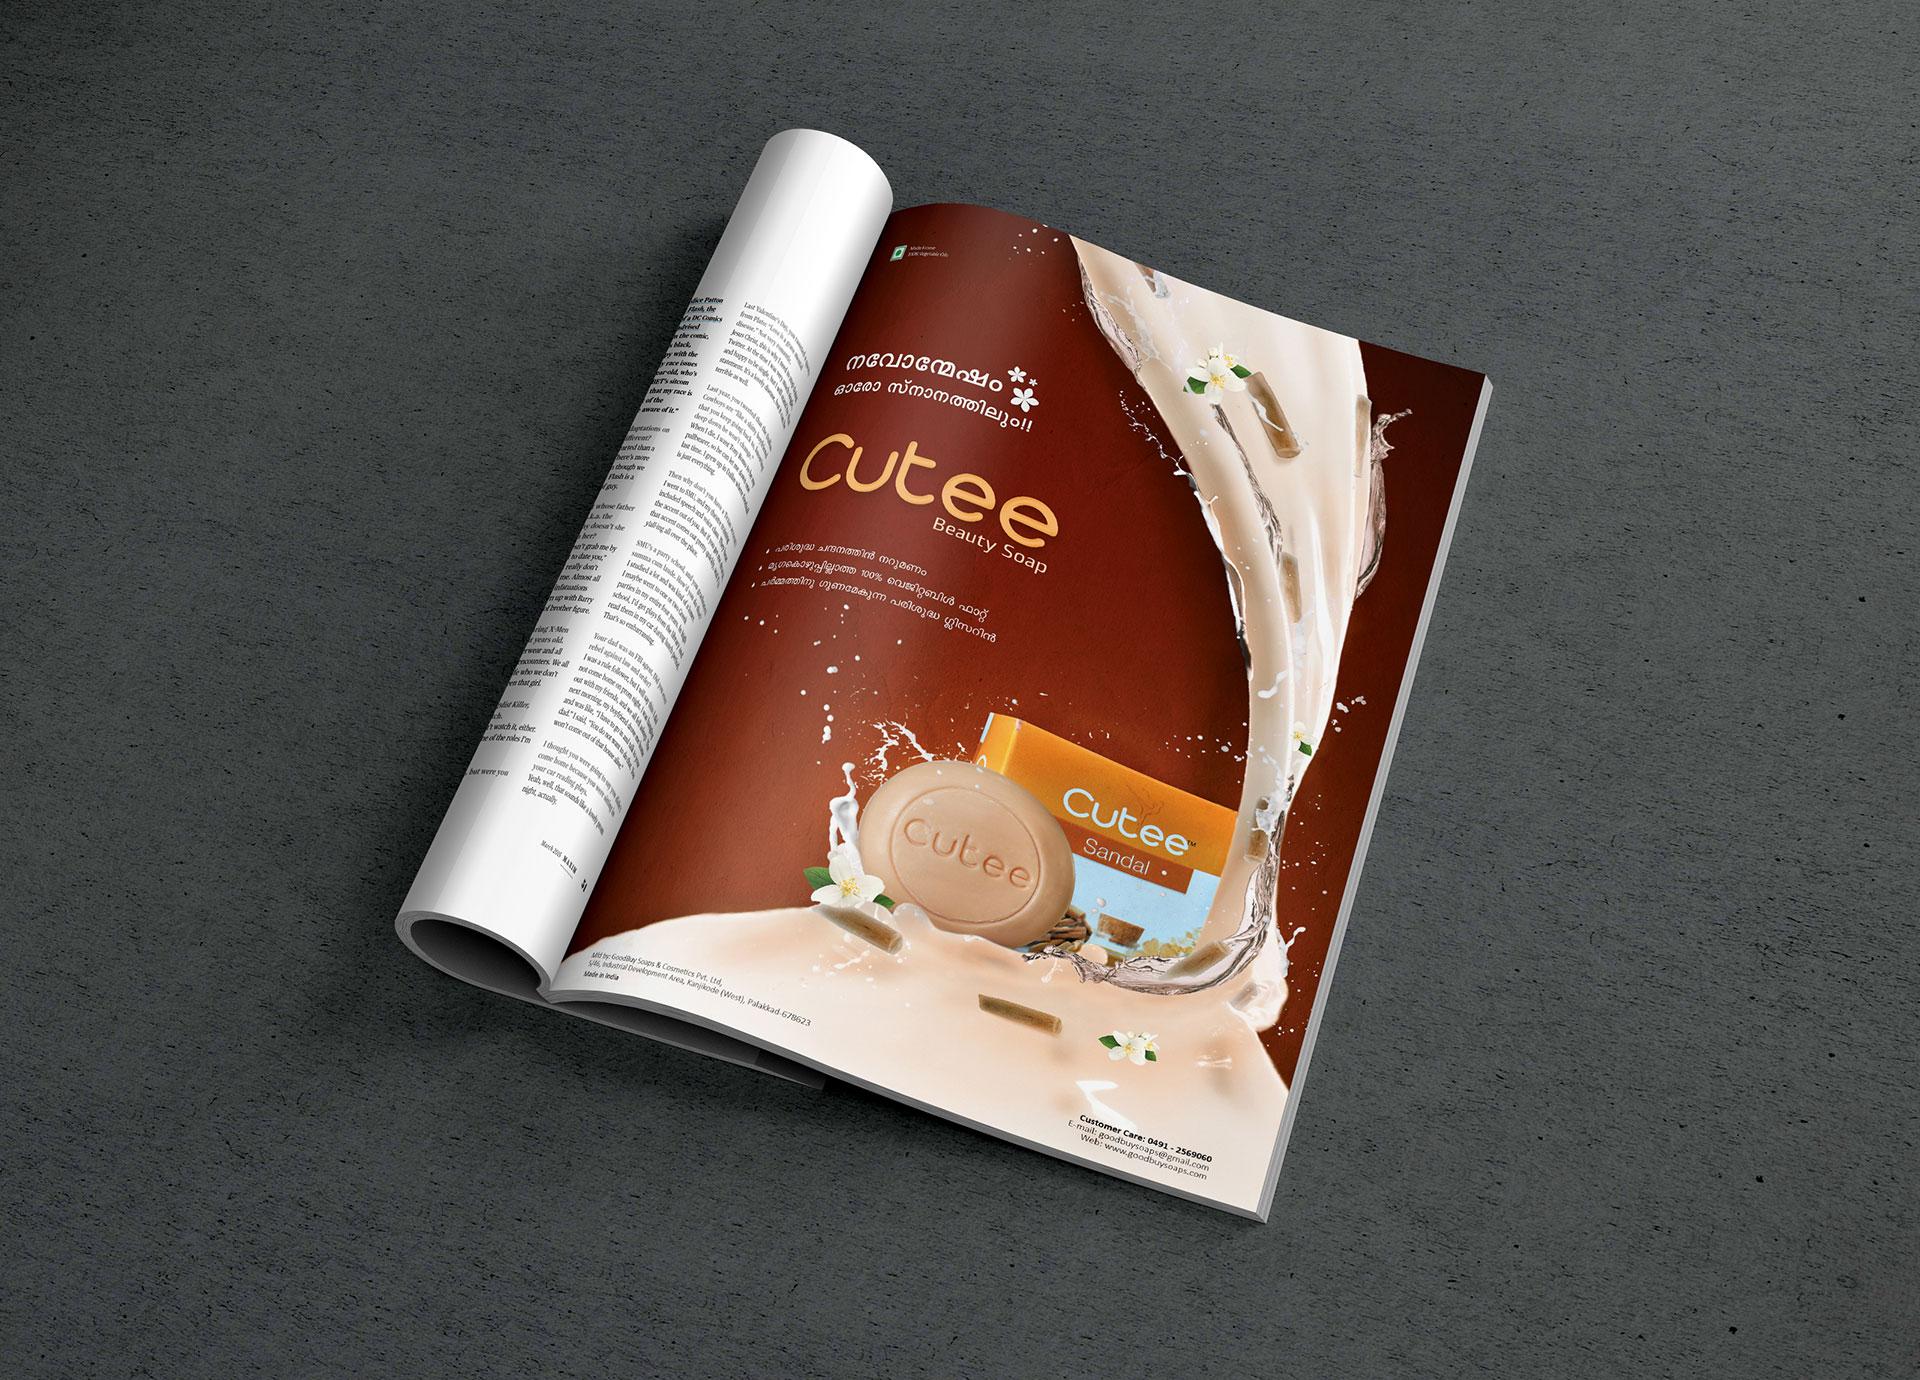 Cutee Soaps Magazine ad design